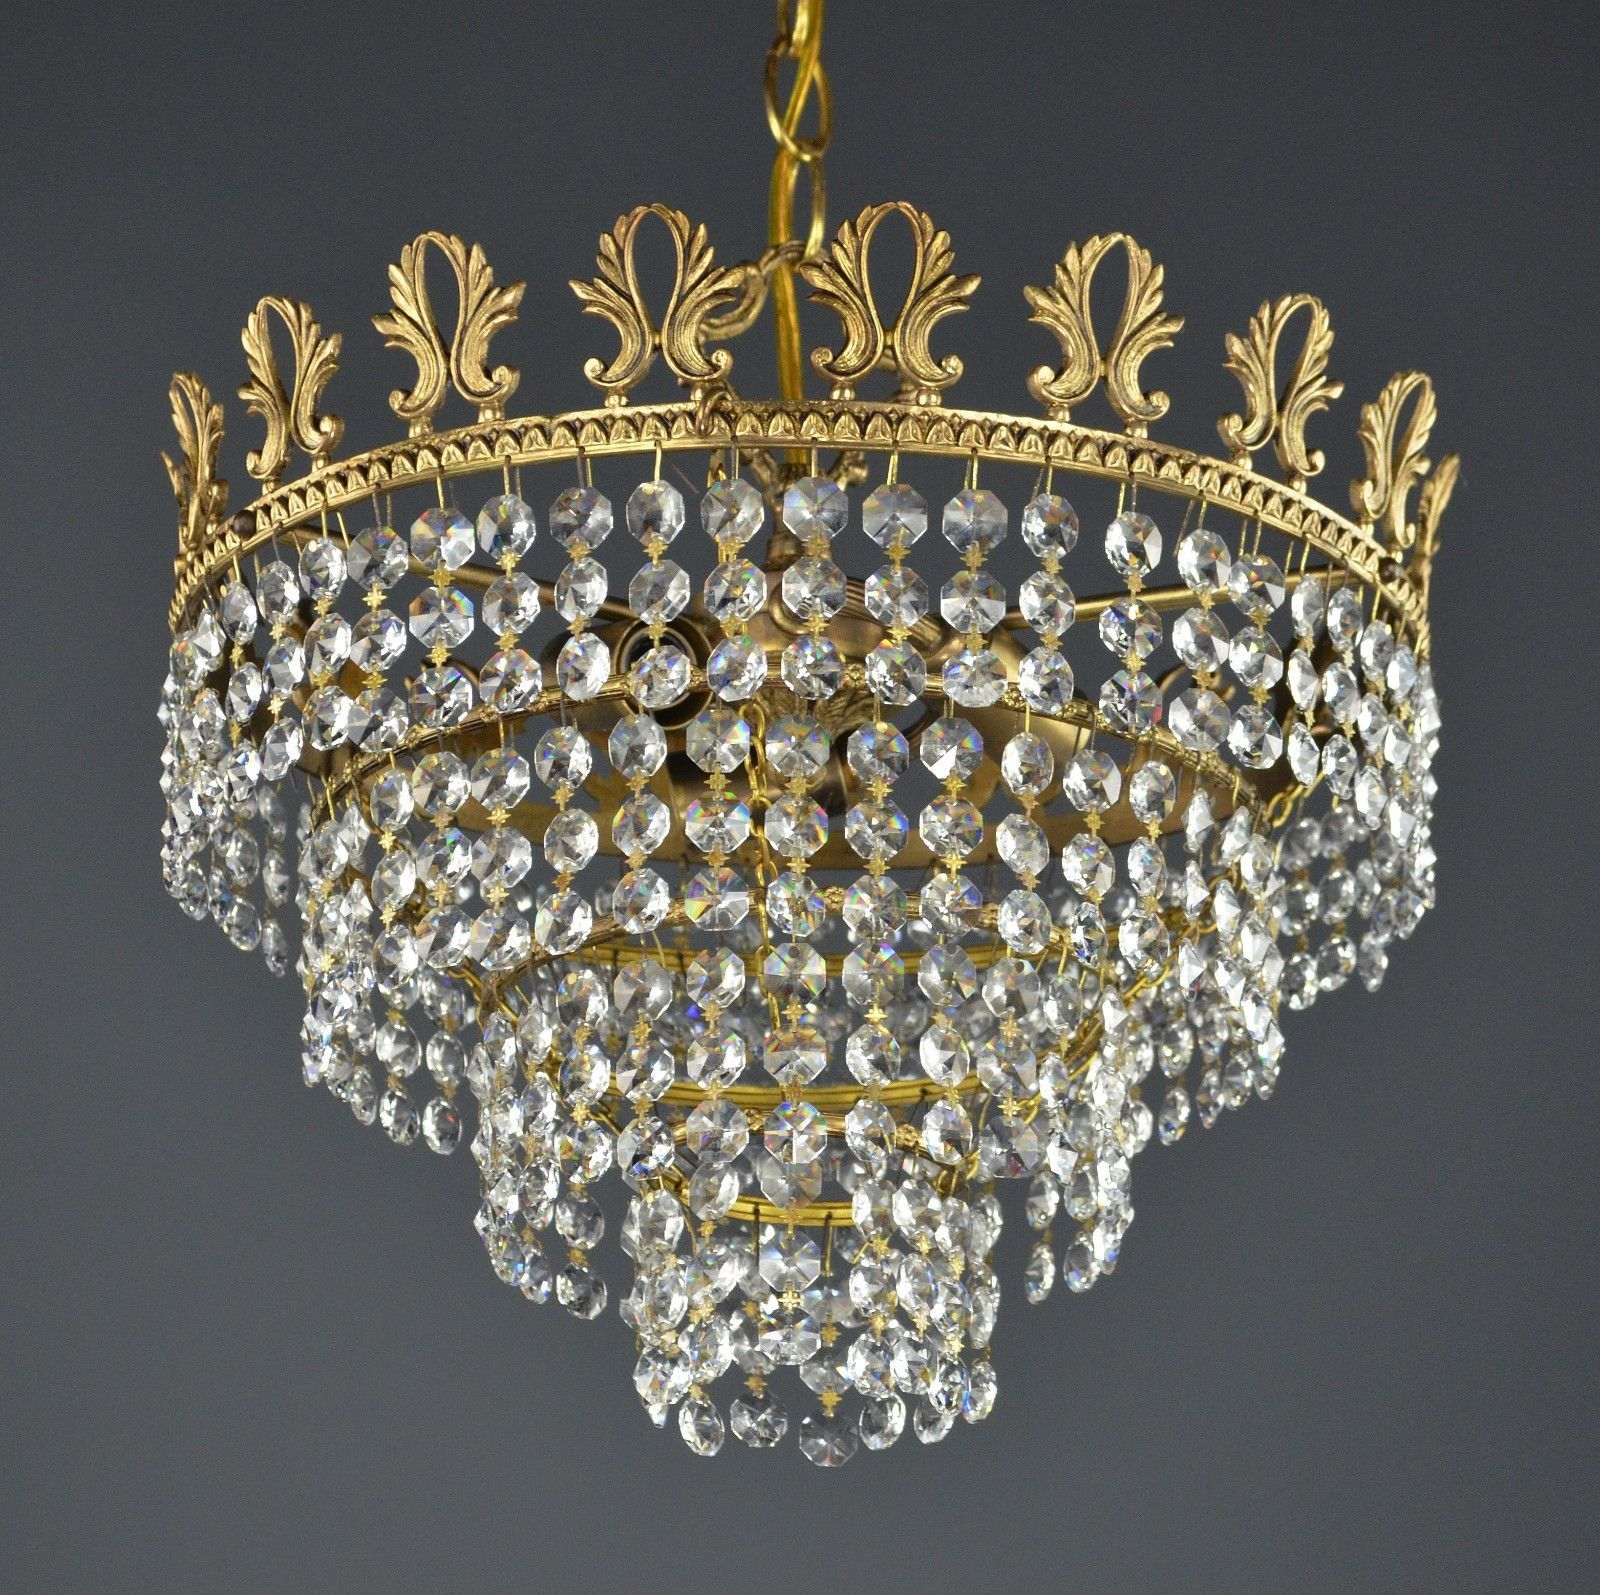 Swarovski crystal crown chandelier c1950 vintage antique gold ornate swarovski crystal crown chandelier c1950 vintage antique gold ornate italian arubaitofo Choice Image